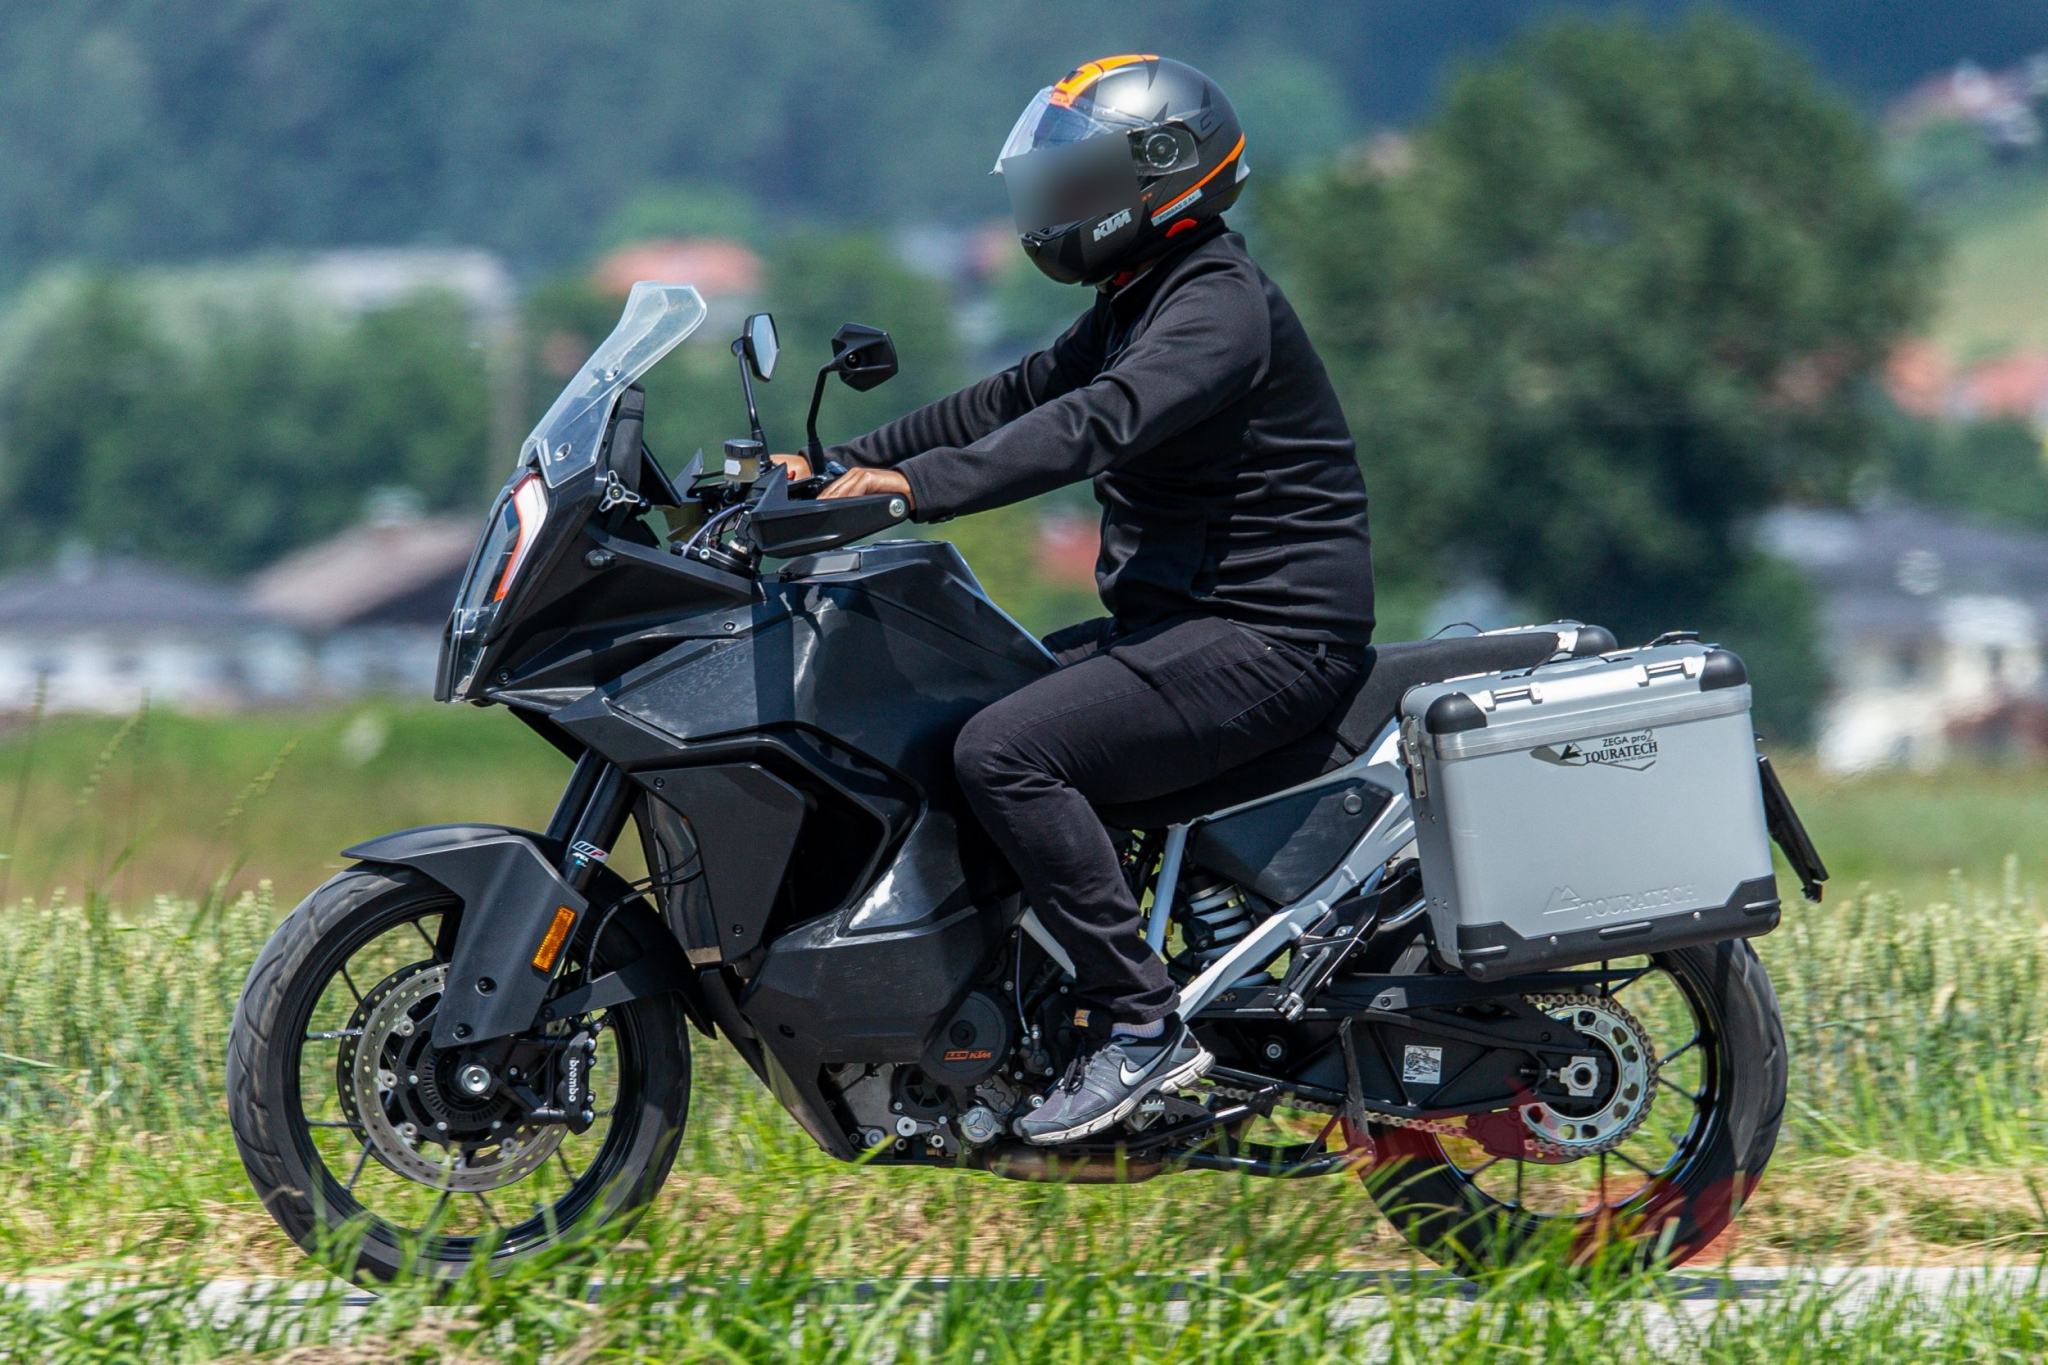 KTM 1290 SUPER ADVENTURE R 2021 - P&H Motorcycles